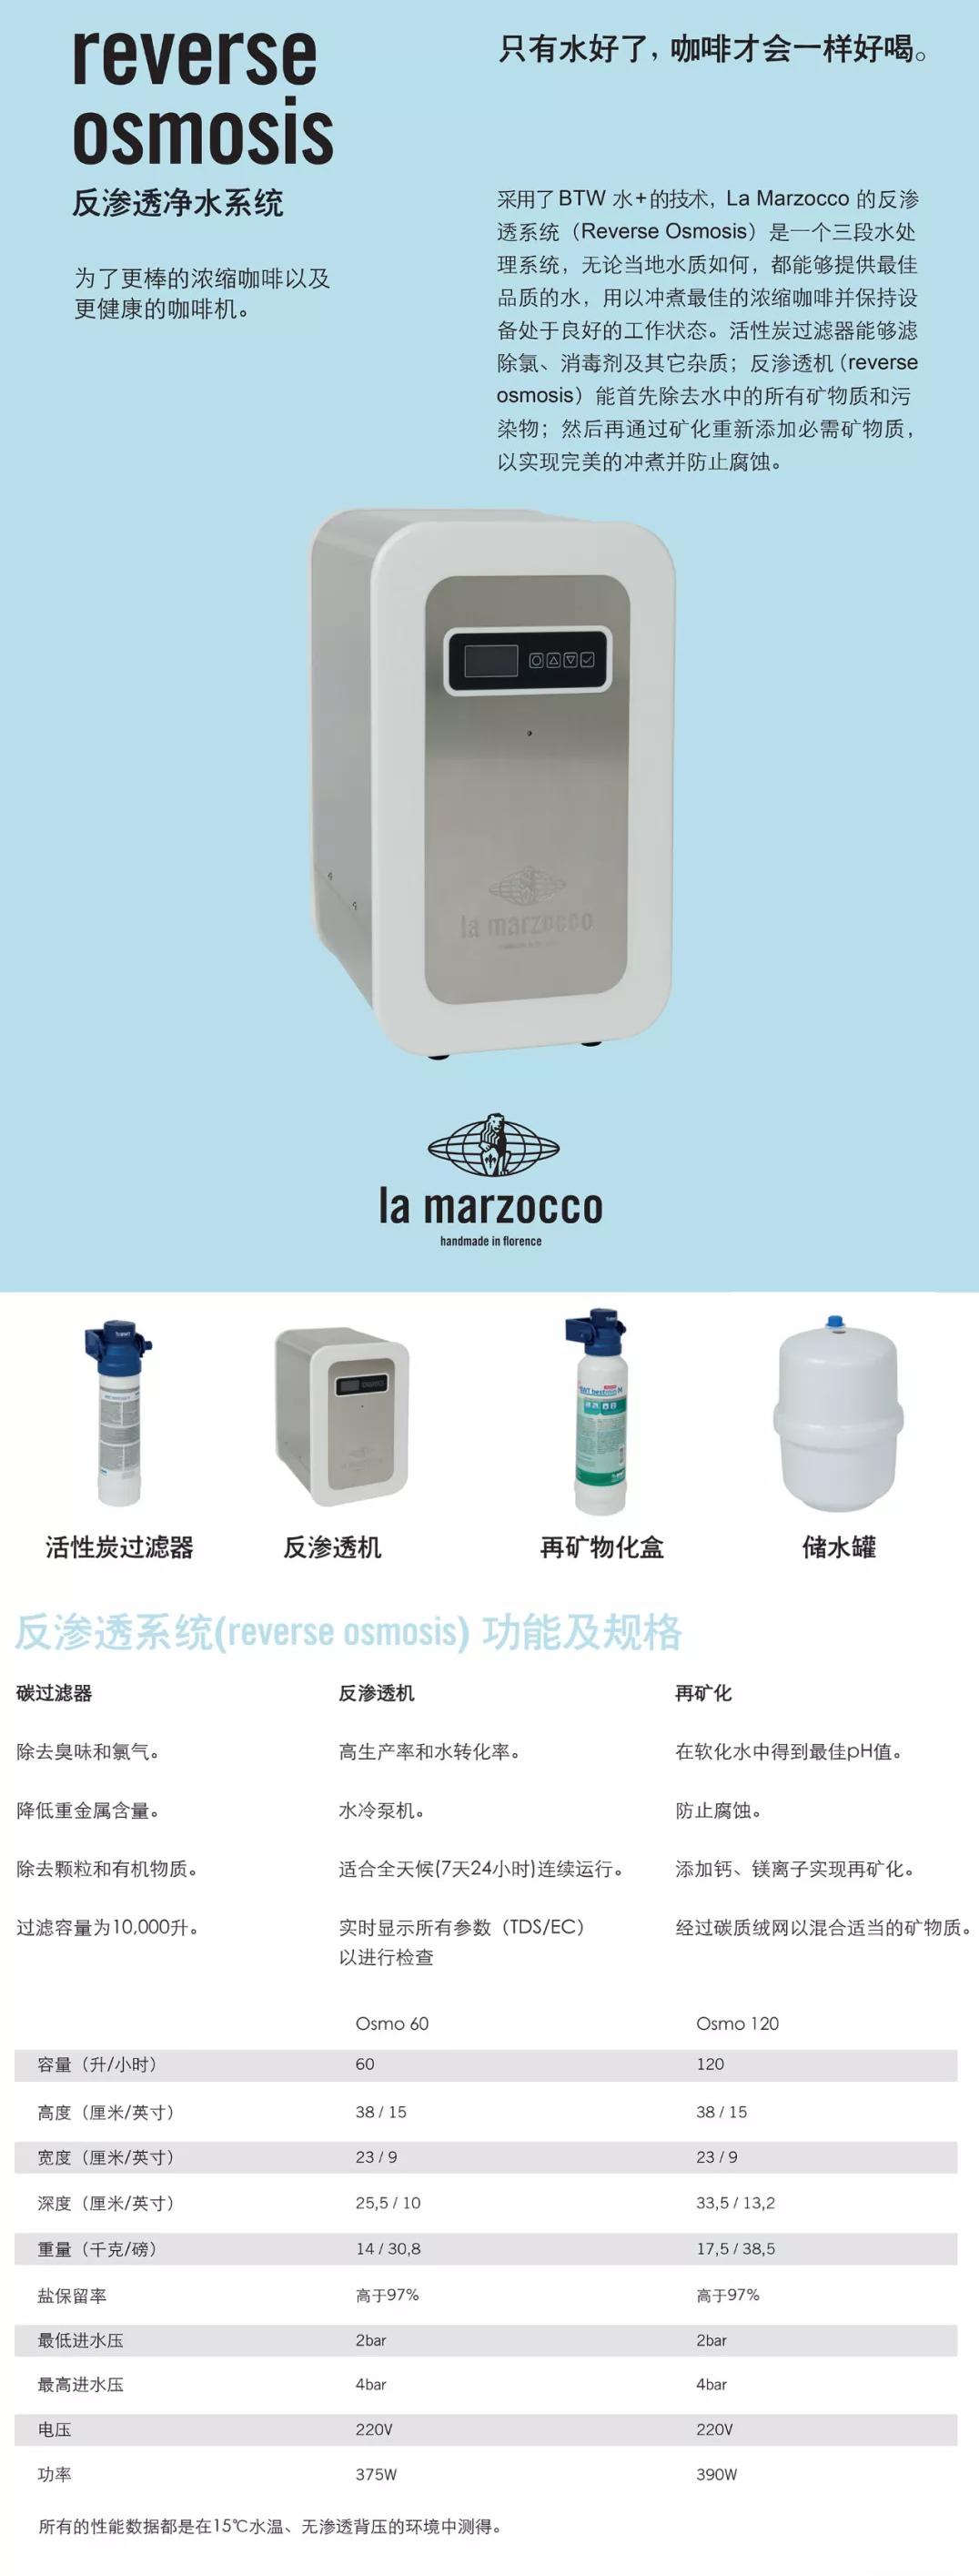 reverse osmosis 反渗透净水系统